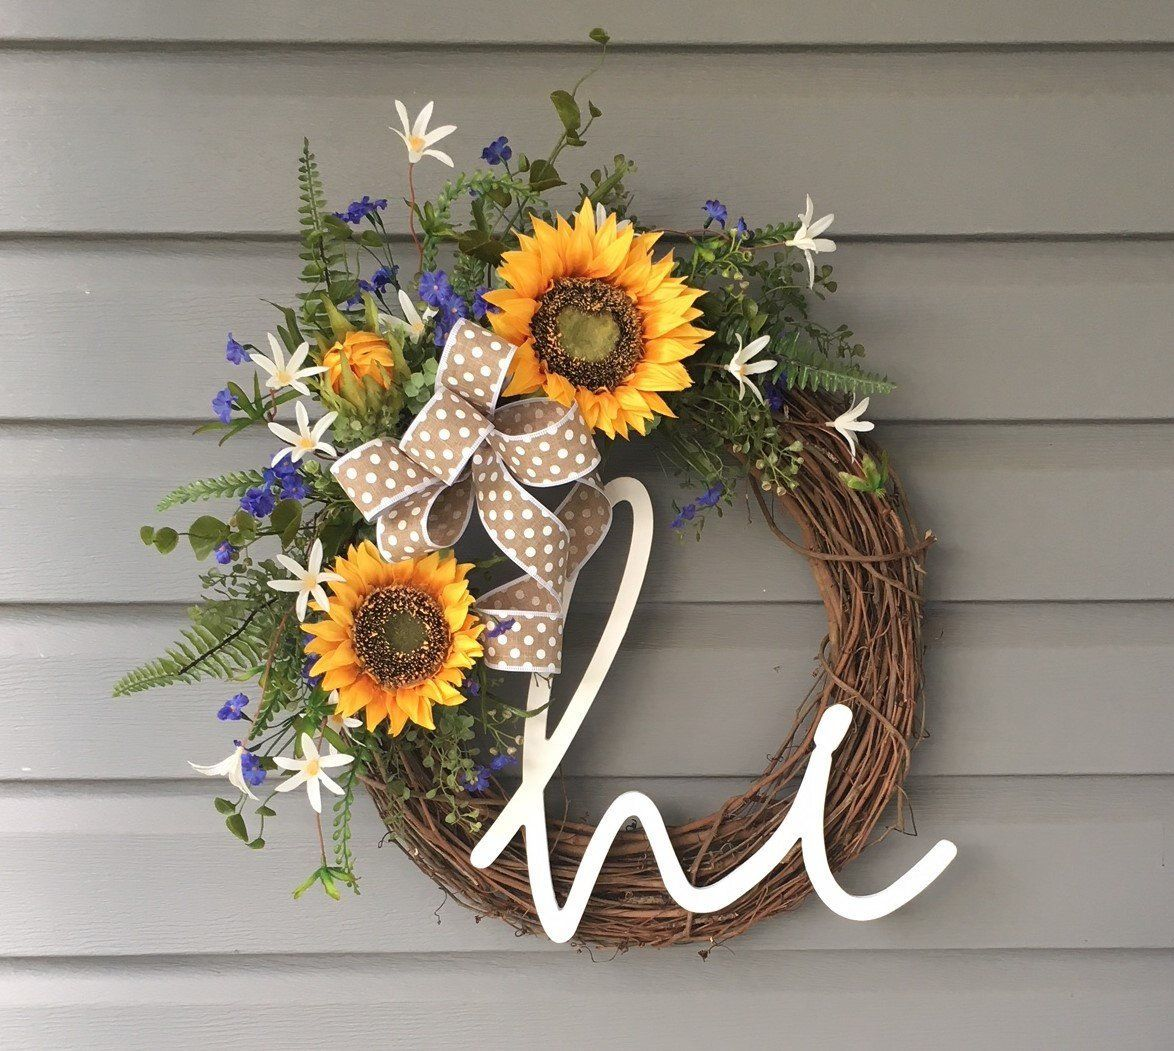 Photo of Summer Wreath for Front Door, Sunflower Hi Wreath, Farmhouse Wreath, Country Wreath, Rustic Wreath, Gift for Her, Modern Wreath